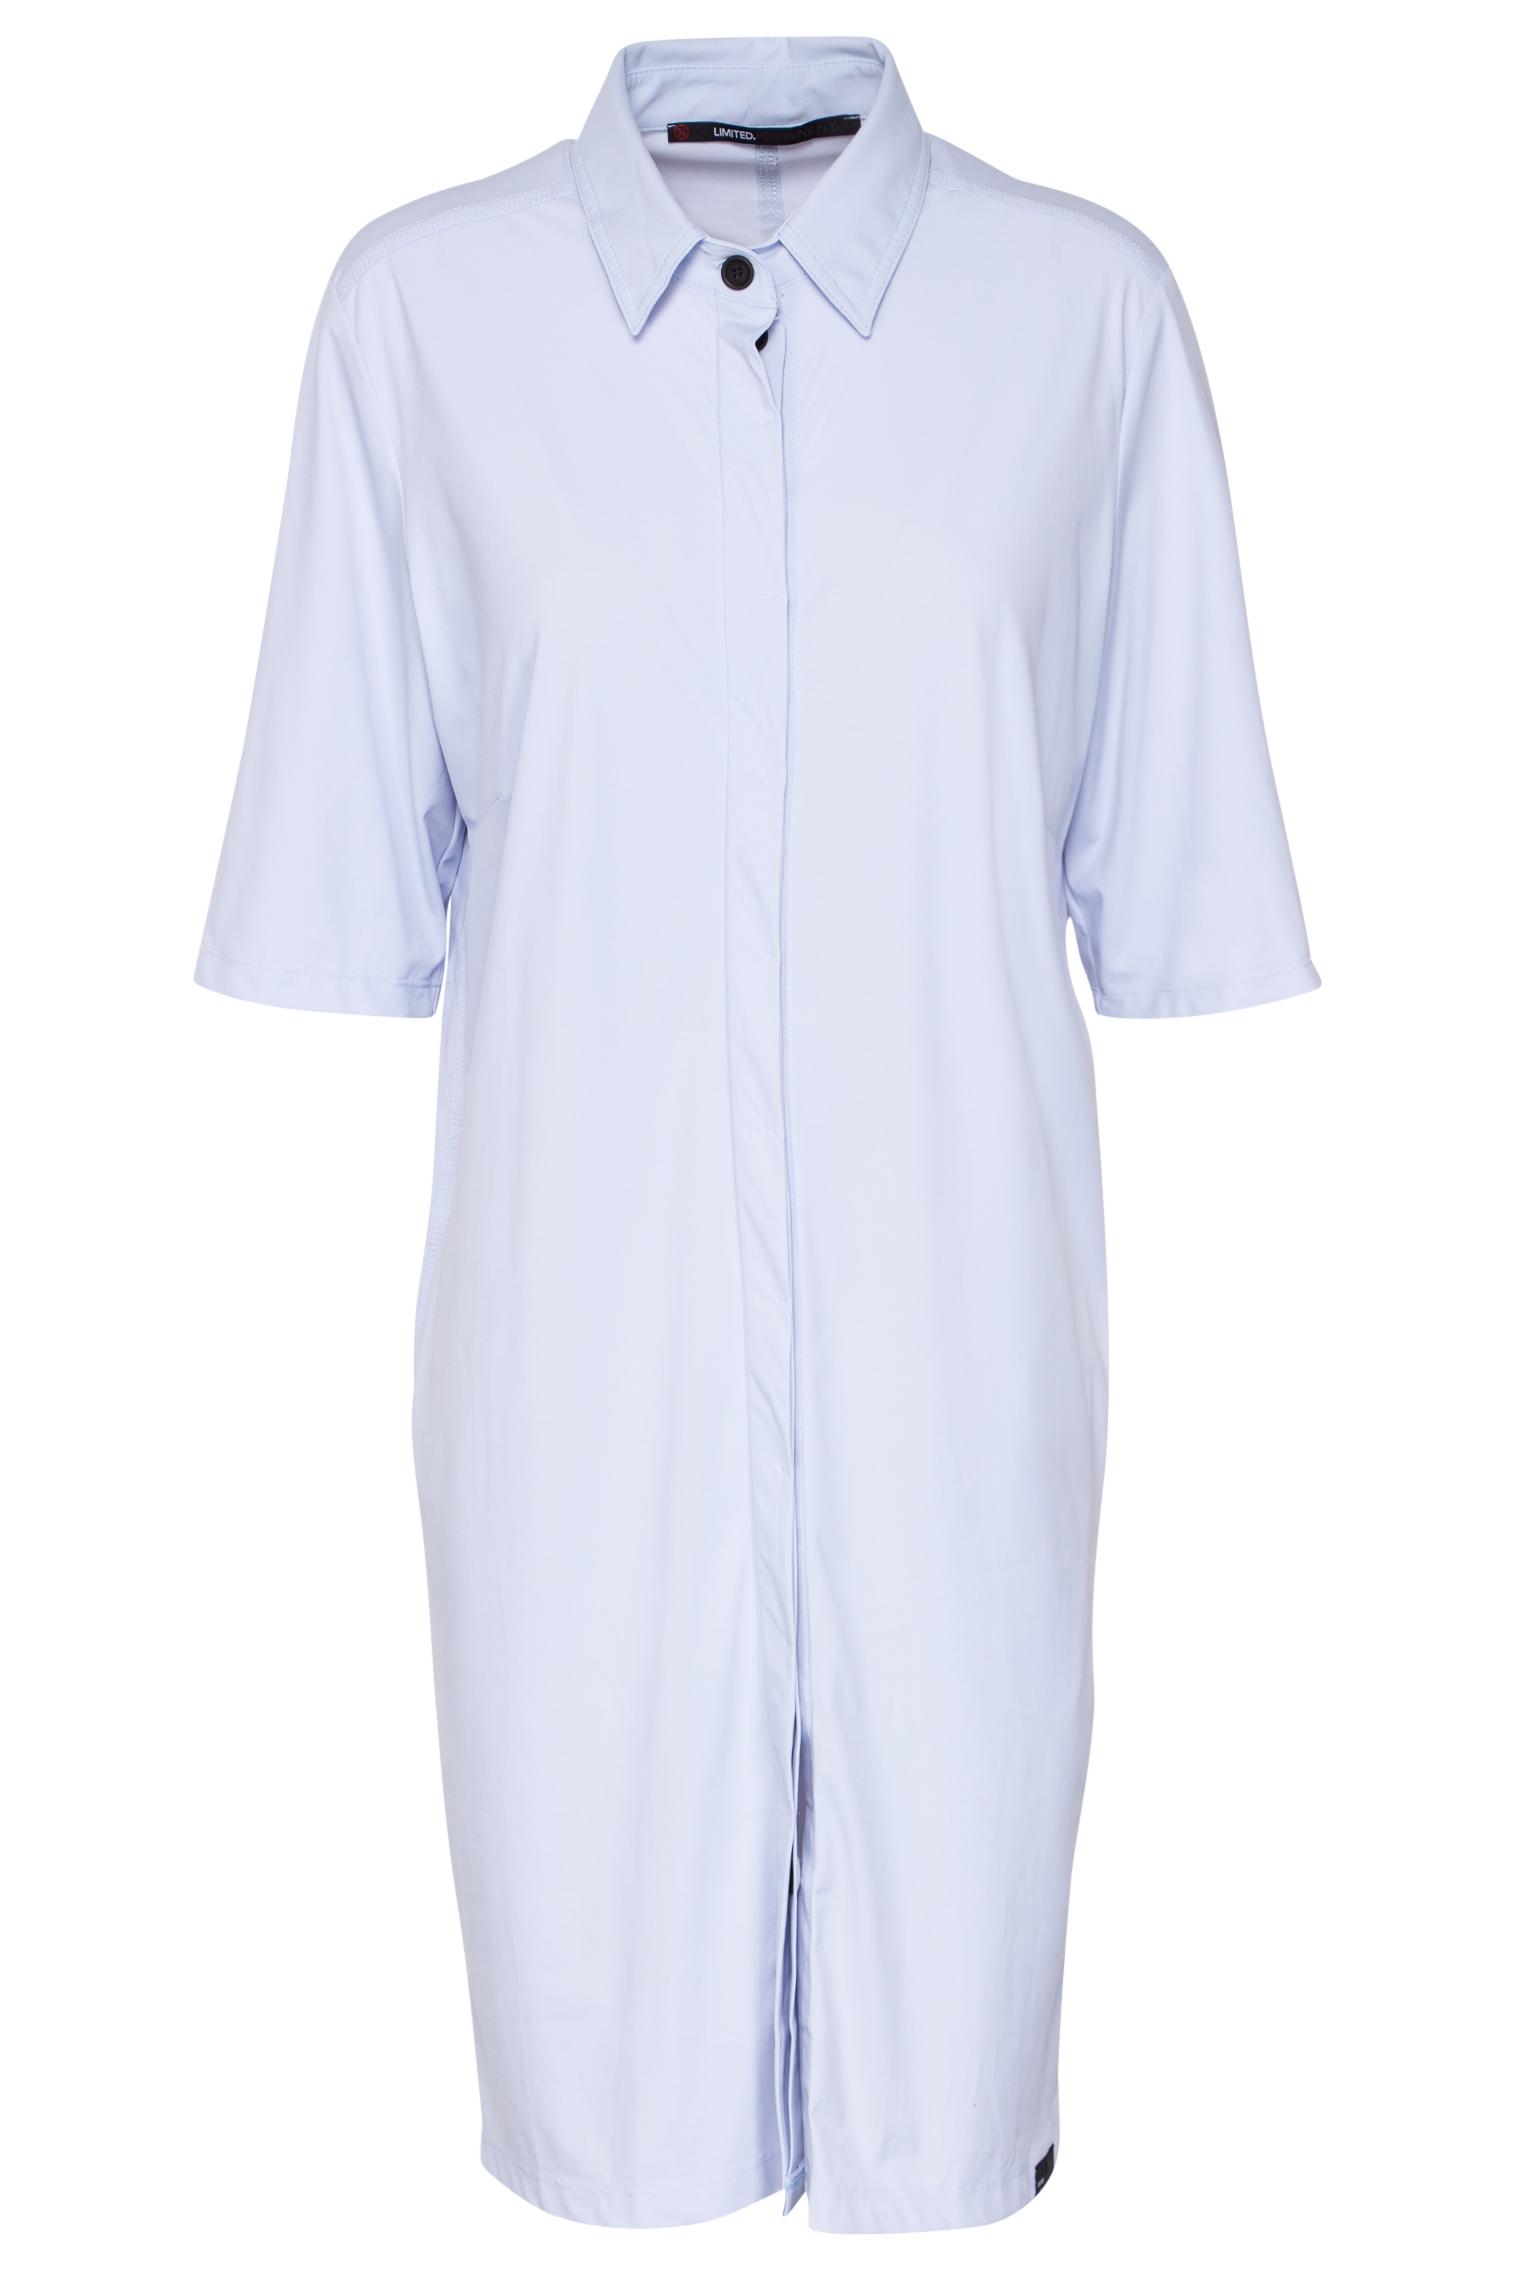 Lichtblauwe dames jurk/blouse Penn & Ink